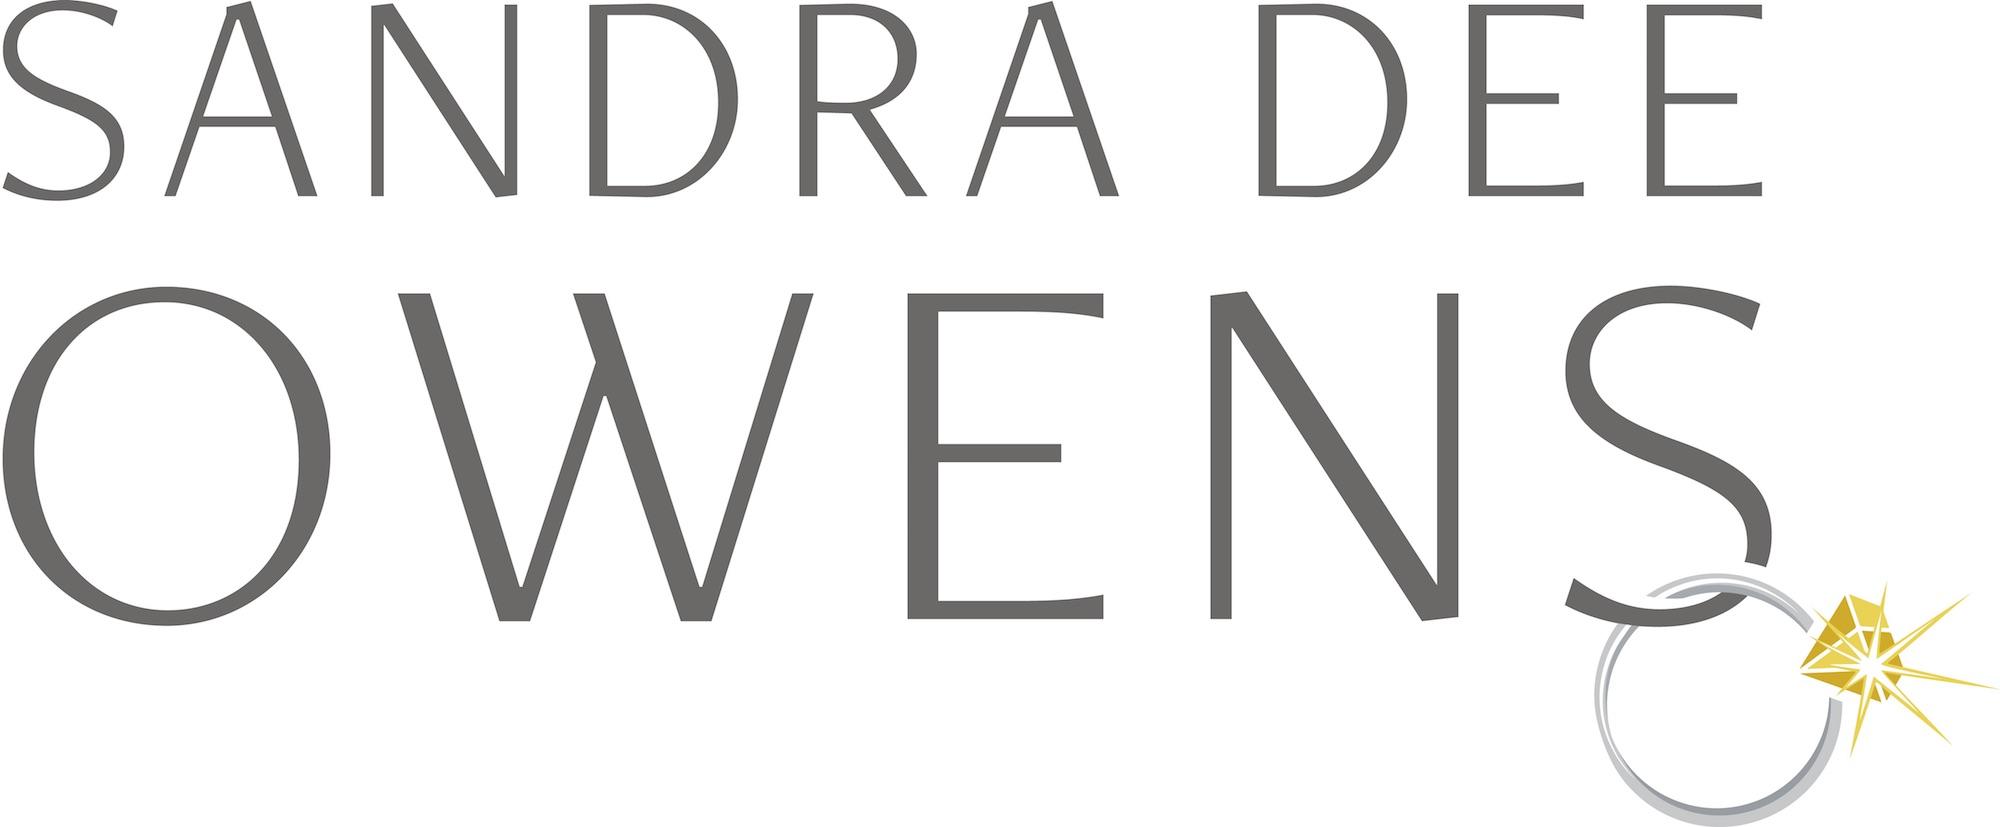 SDO-logo-FinalAsset 37.jpg